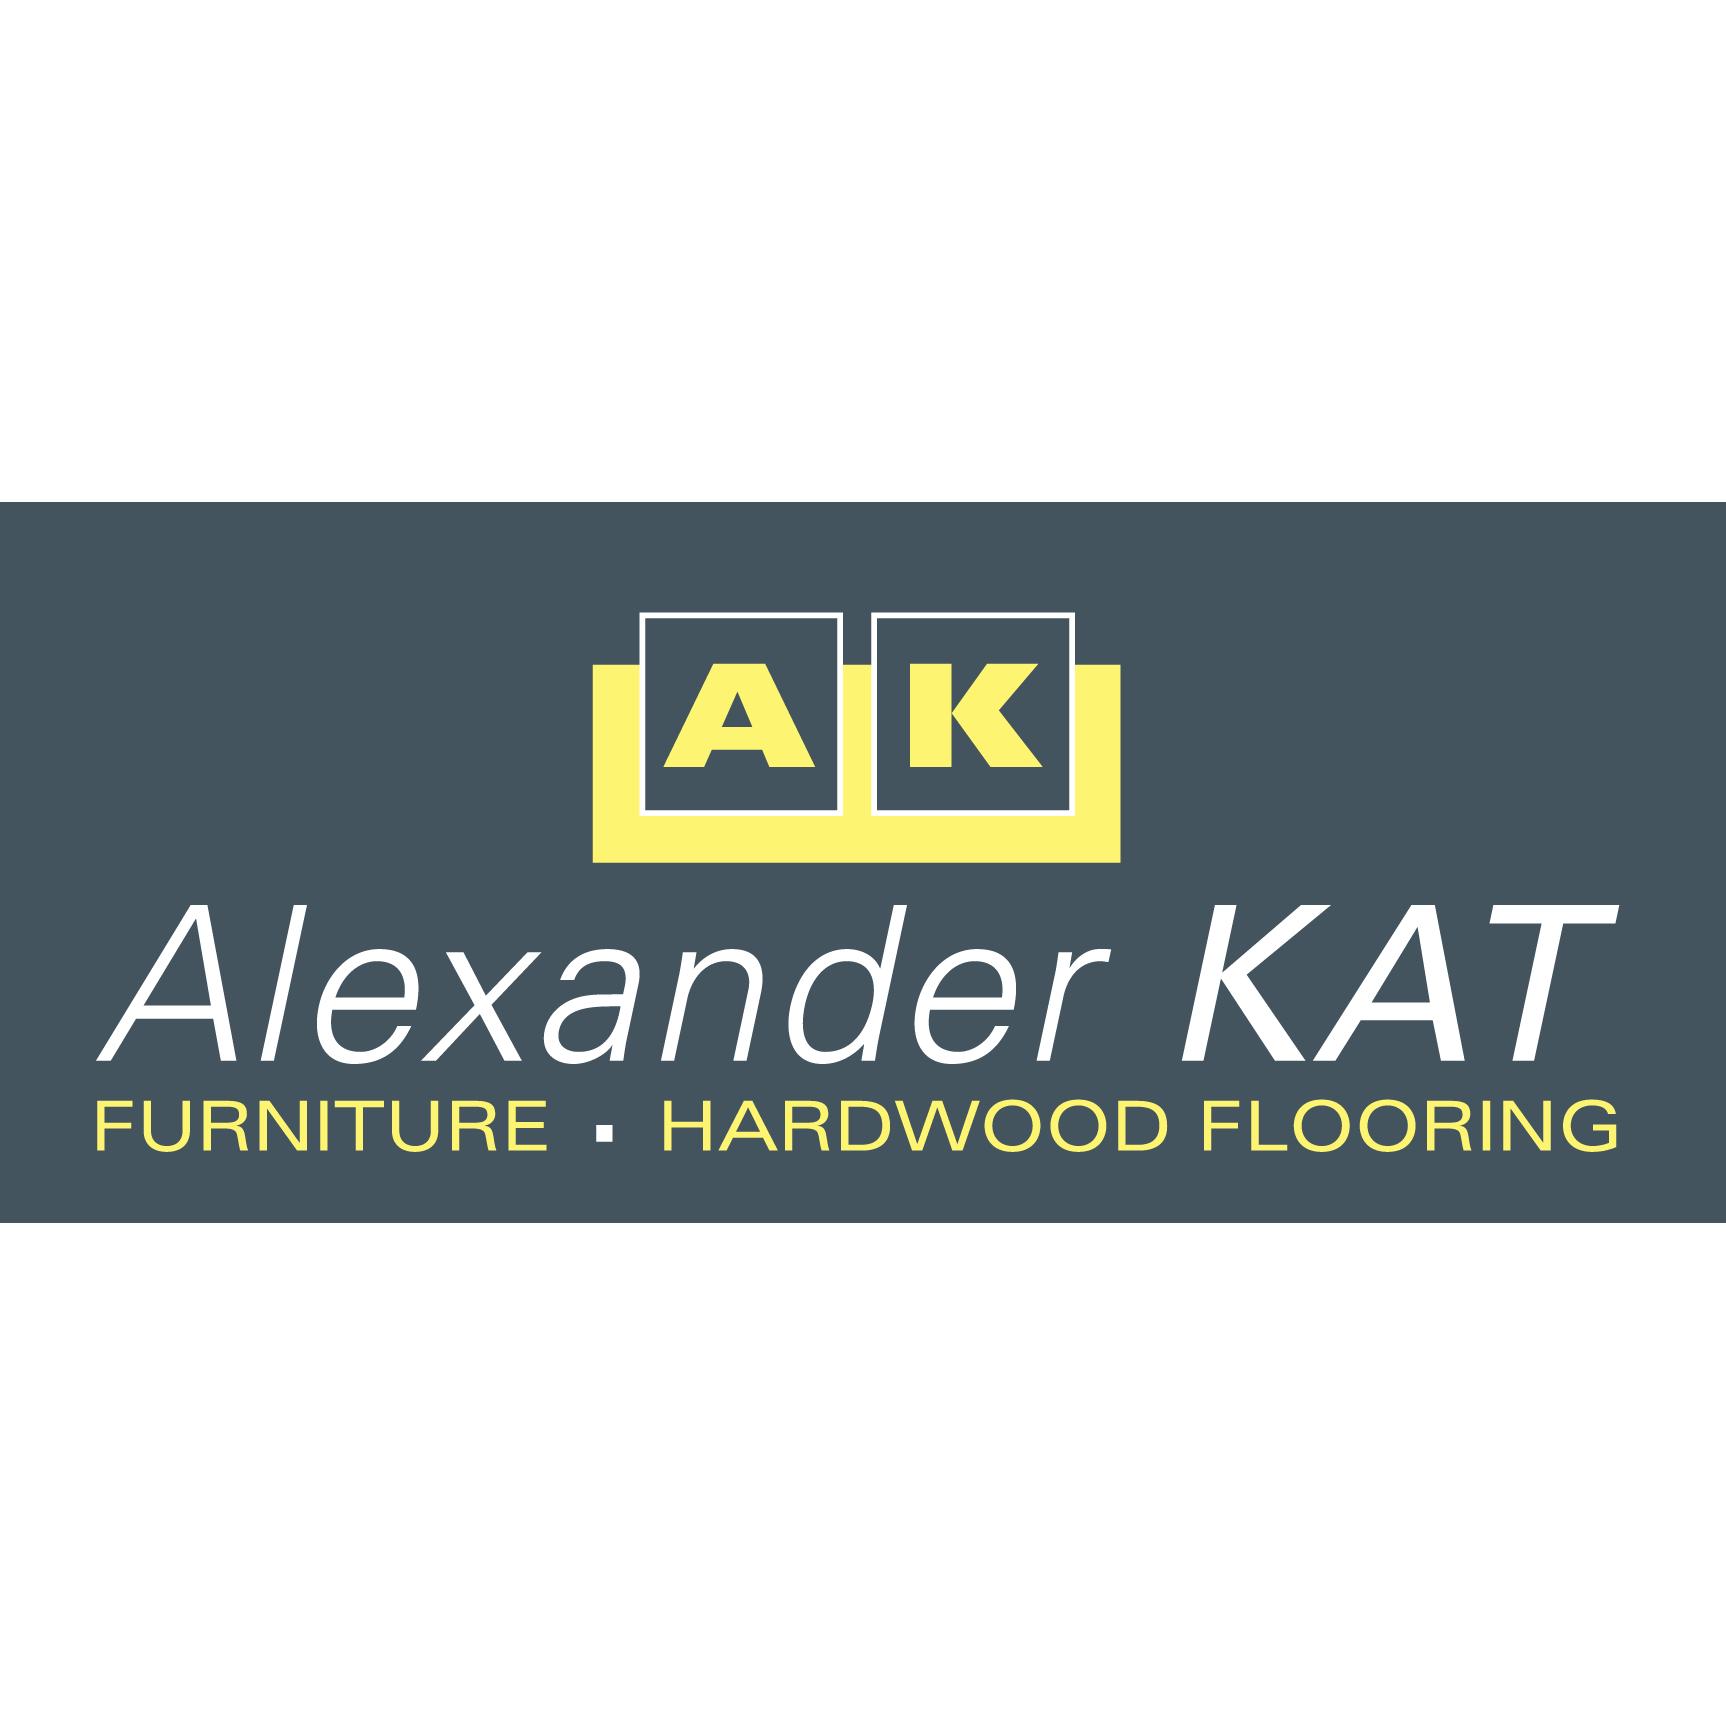 Alexander Kat Furniture and Hardwood Flooring